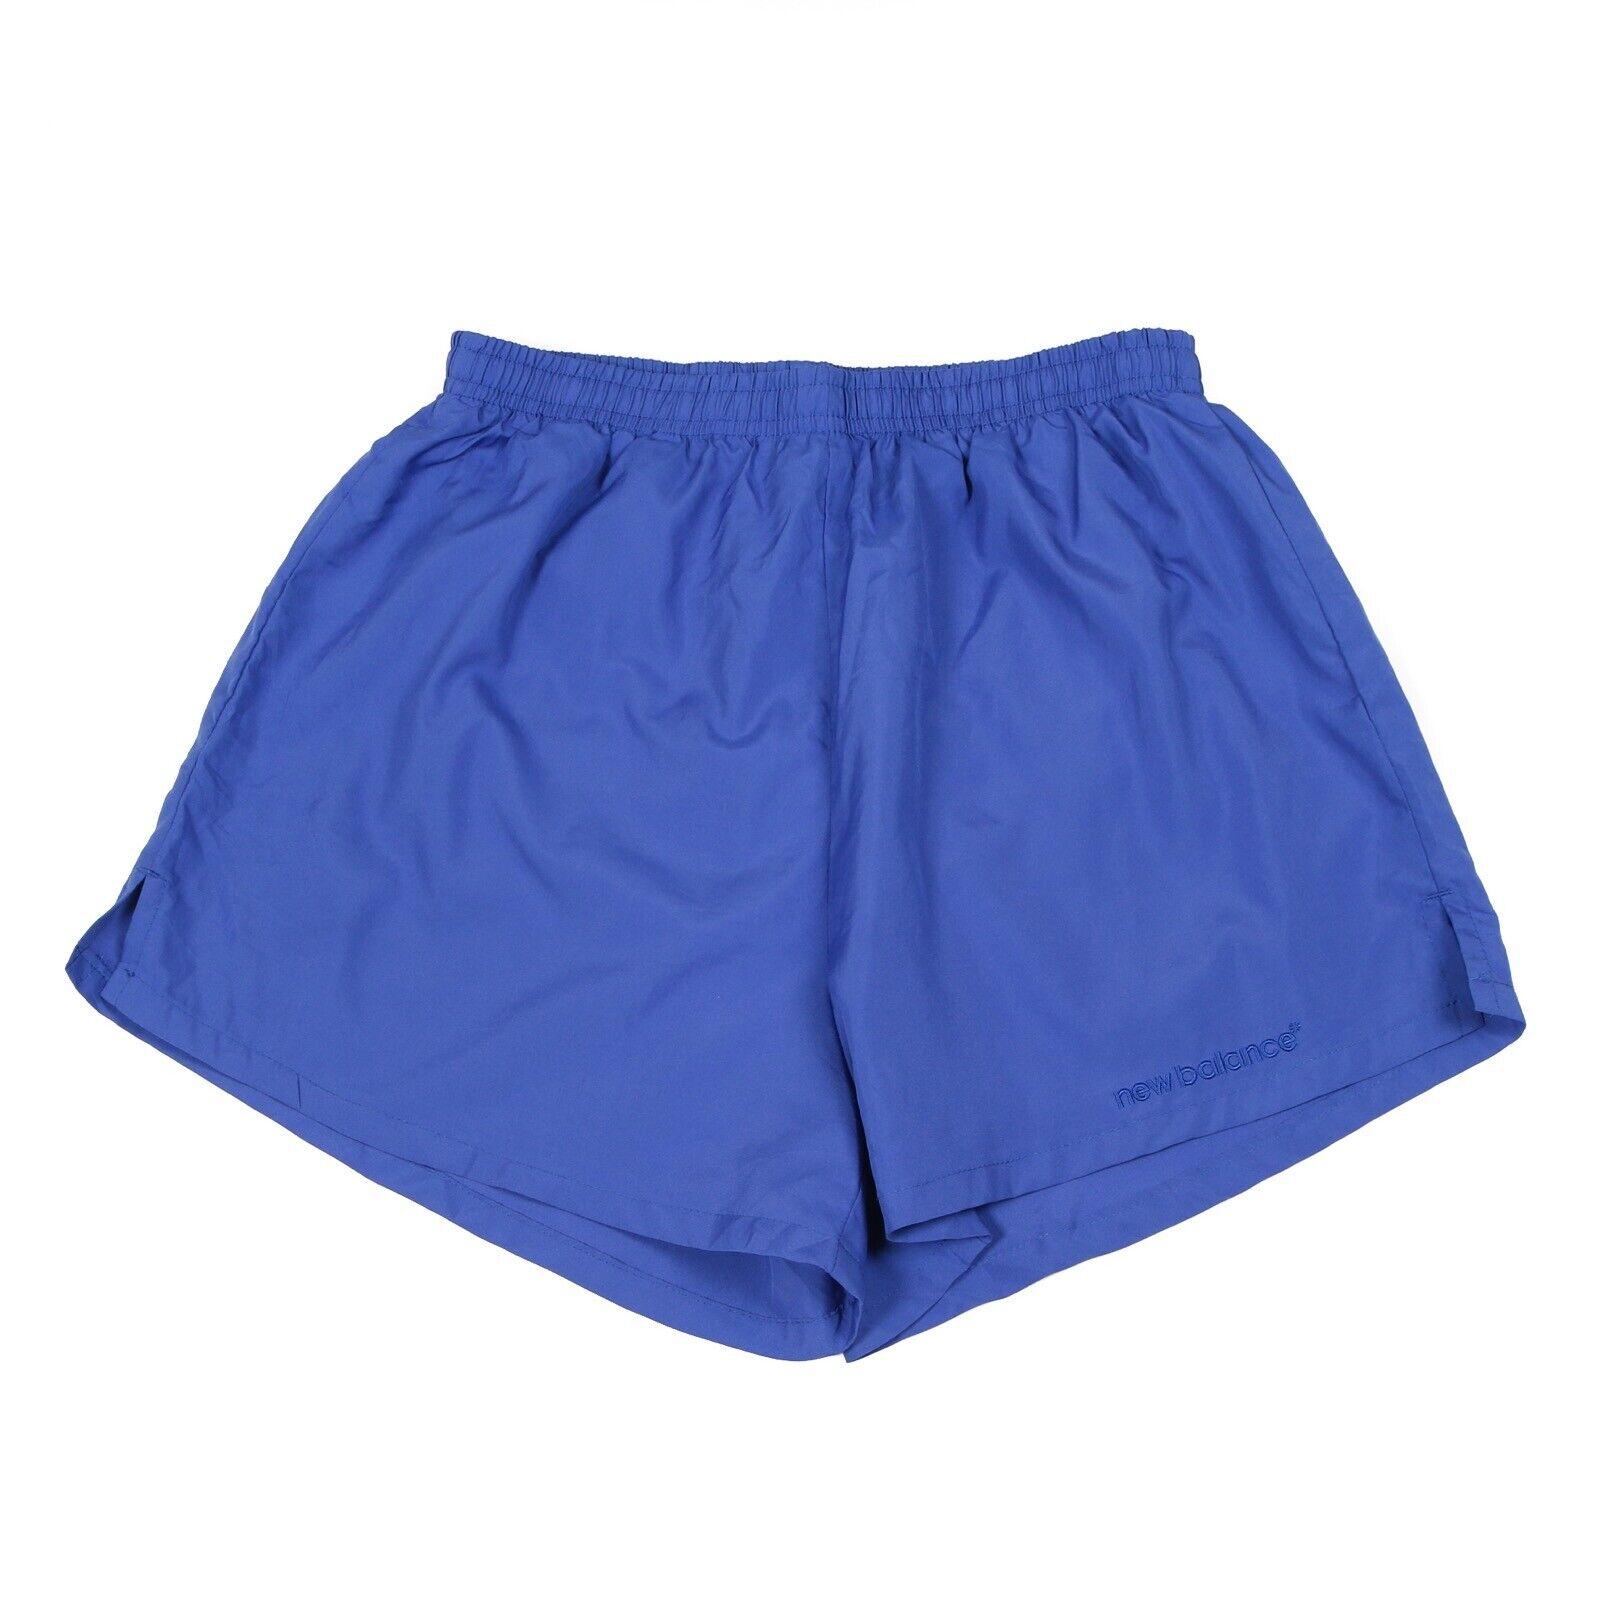 NEW BALANCE Running Shorts | Women's S | Sports Gym Sprinter Vintage